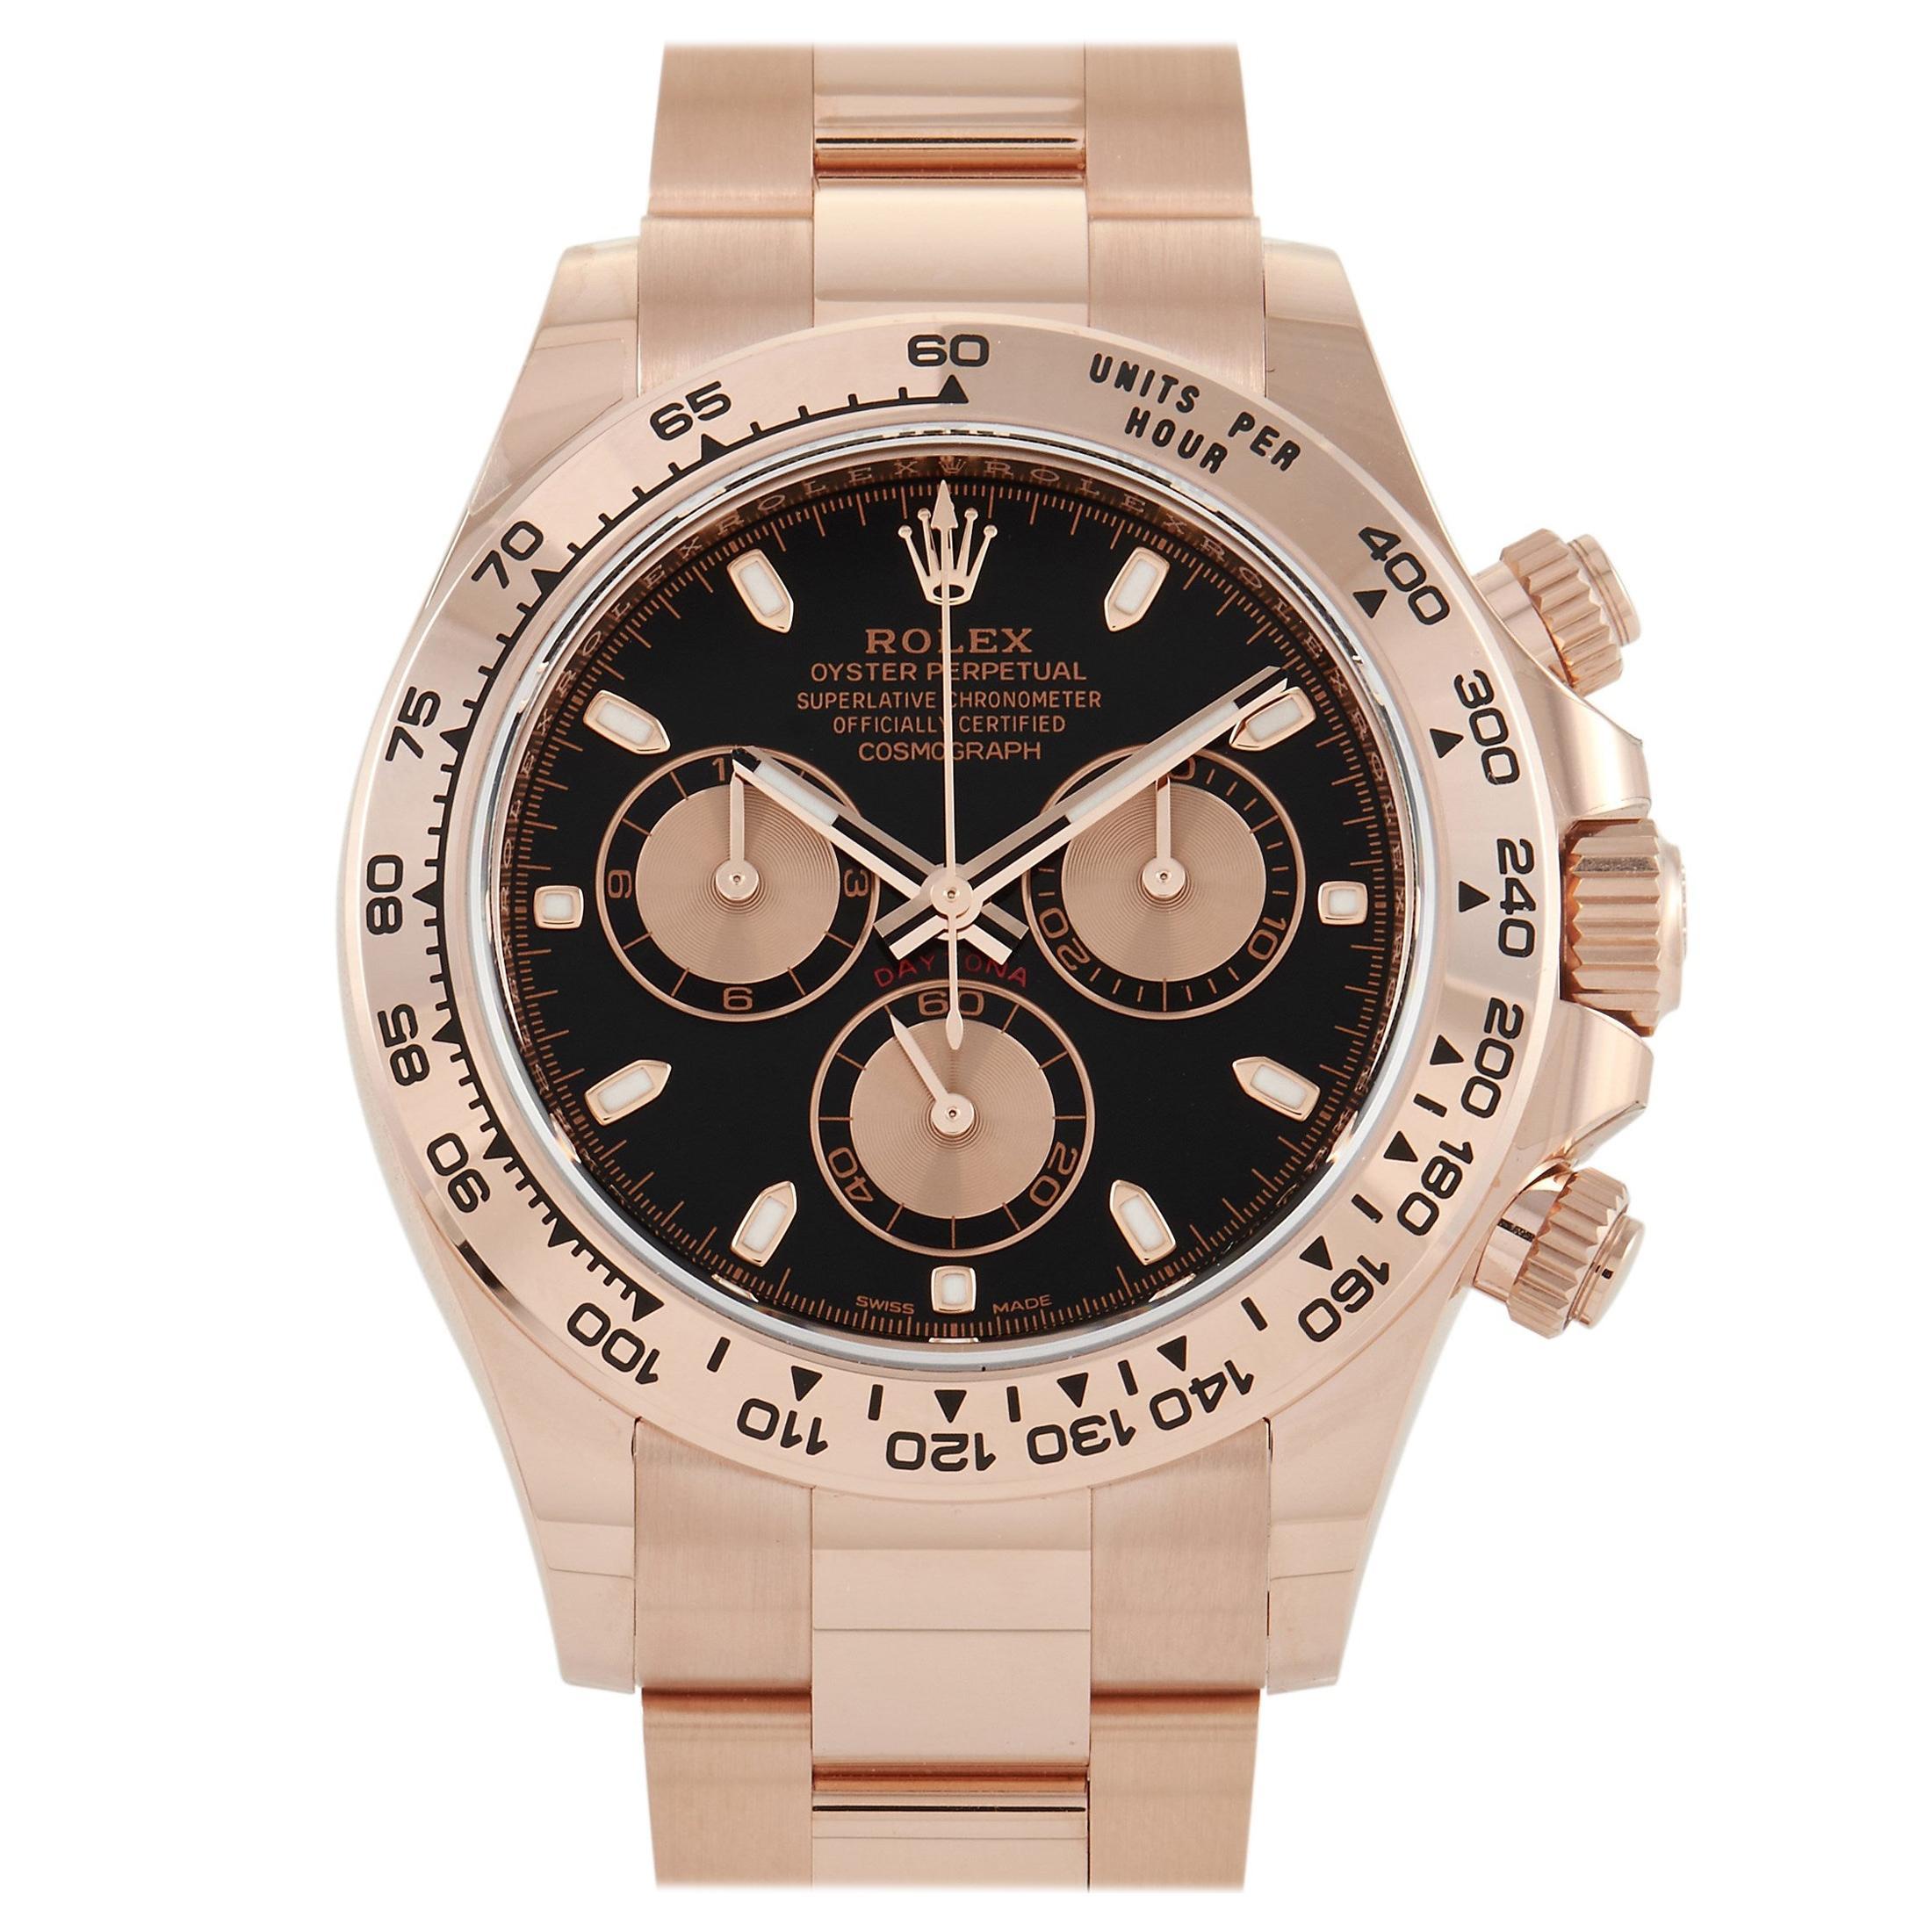 Rolex Cosmograph Daytona Everose Gold Chronograph Watch 116505